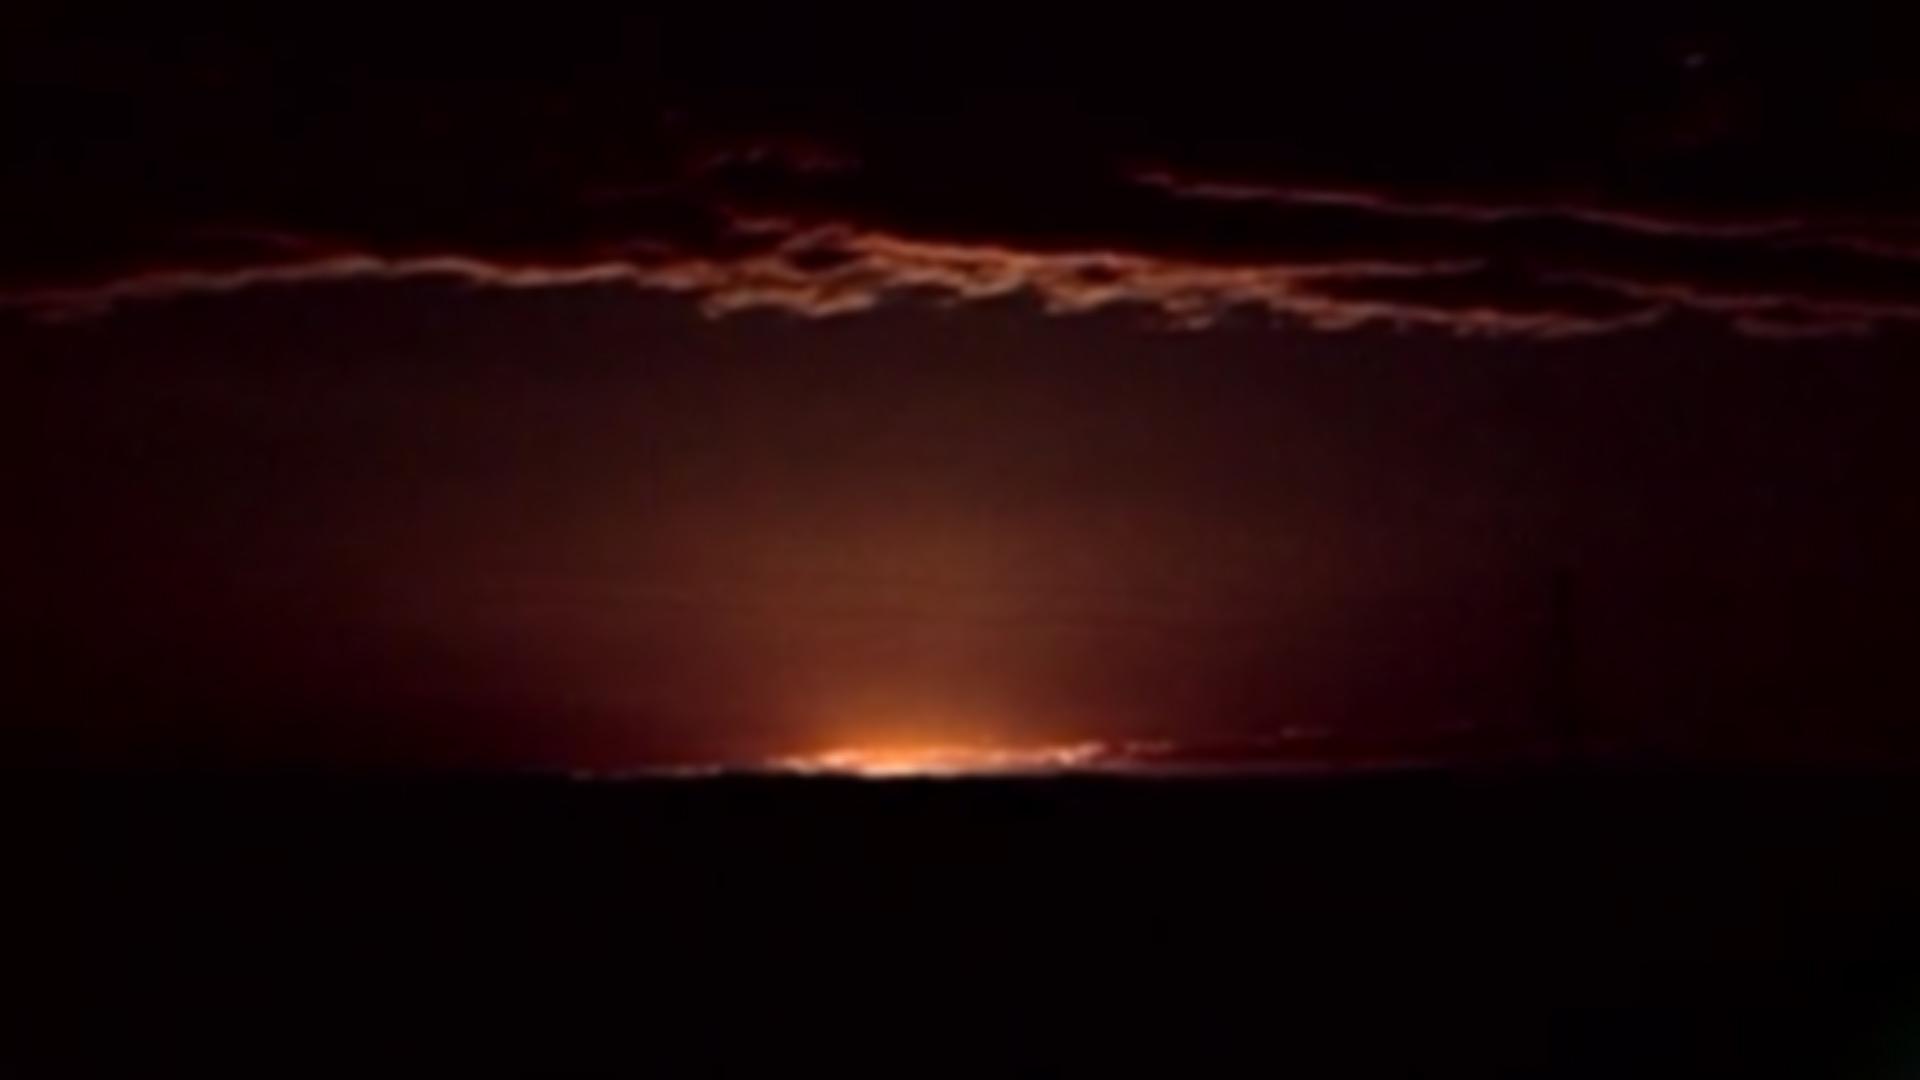 KFriesen_VideoStill_Nightingales_02.jpg